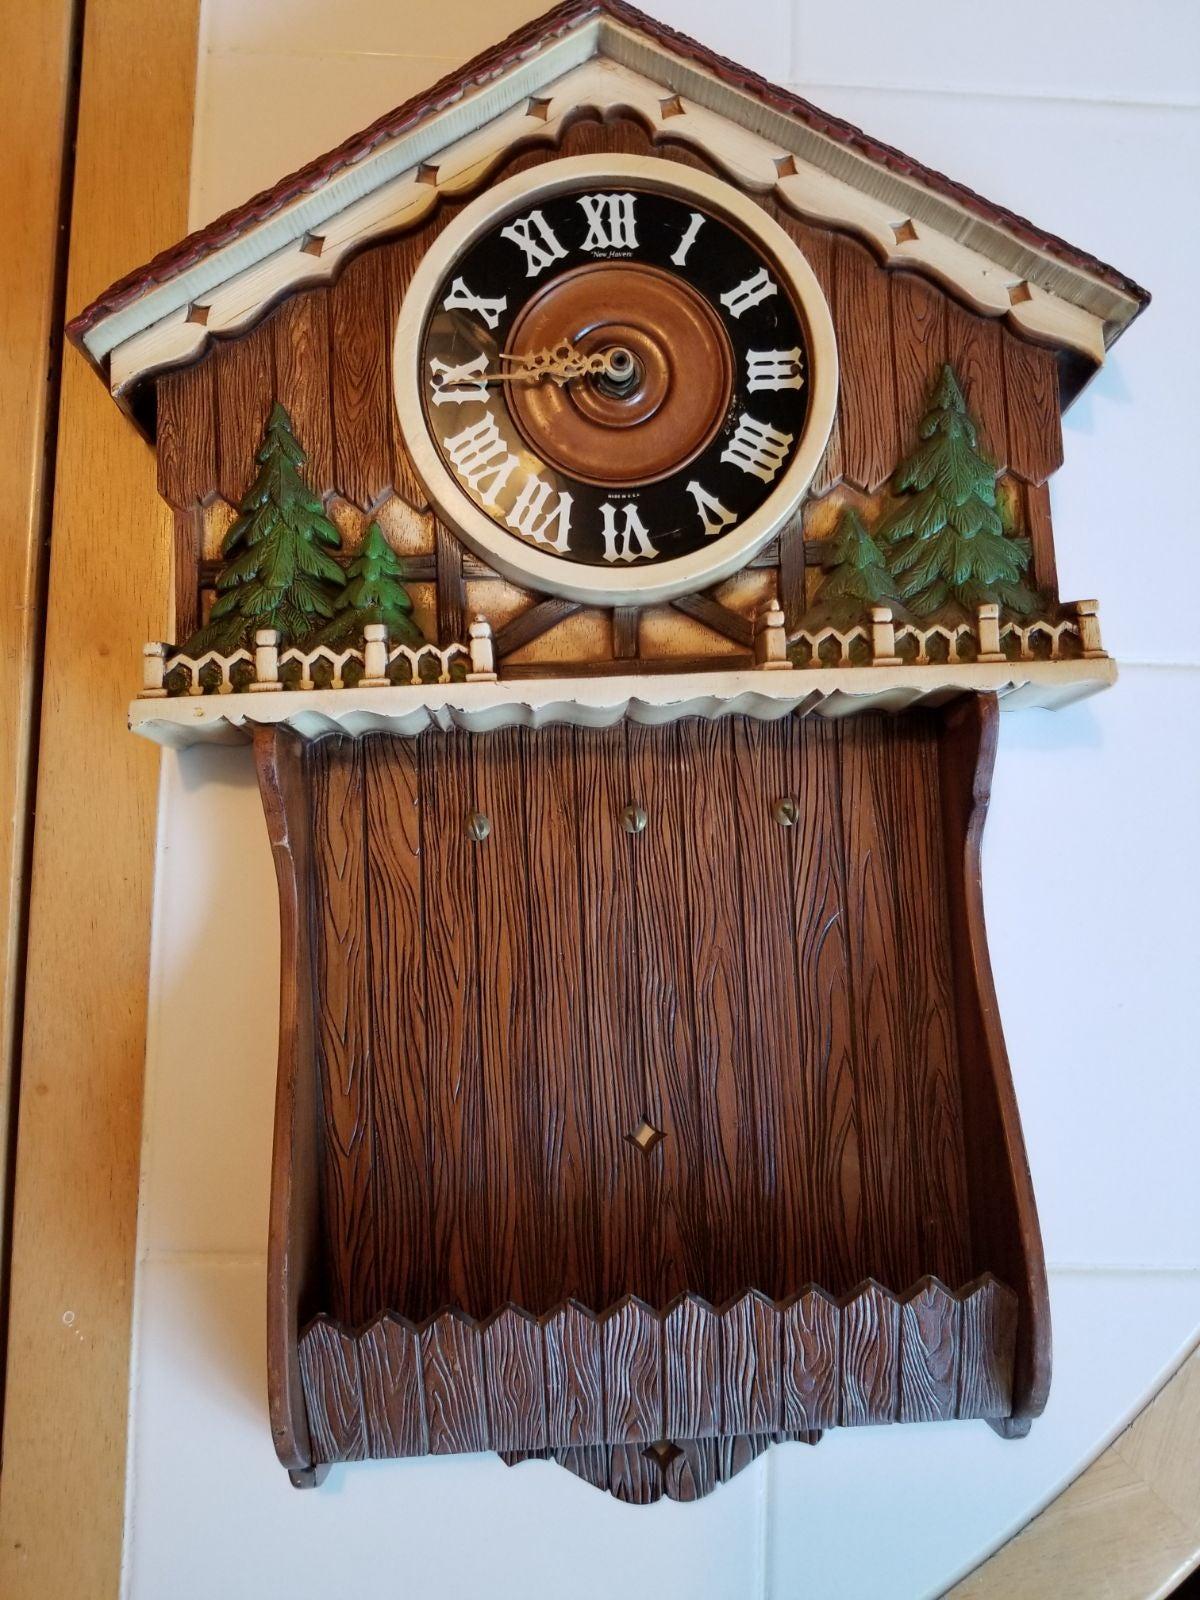 syroco mcm homeco burwood clock/key hang